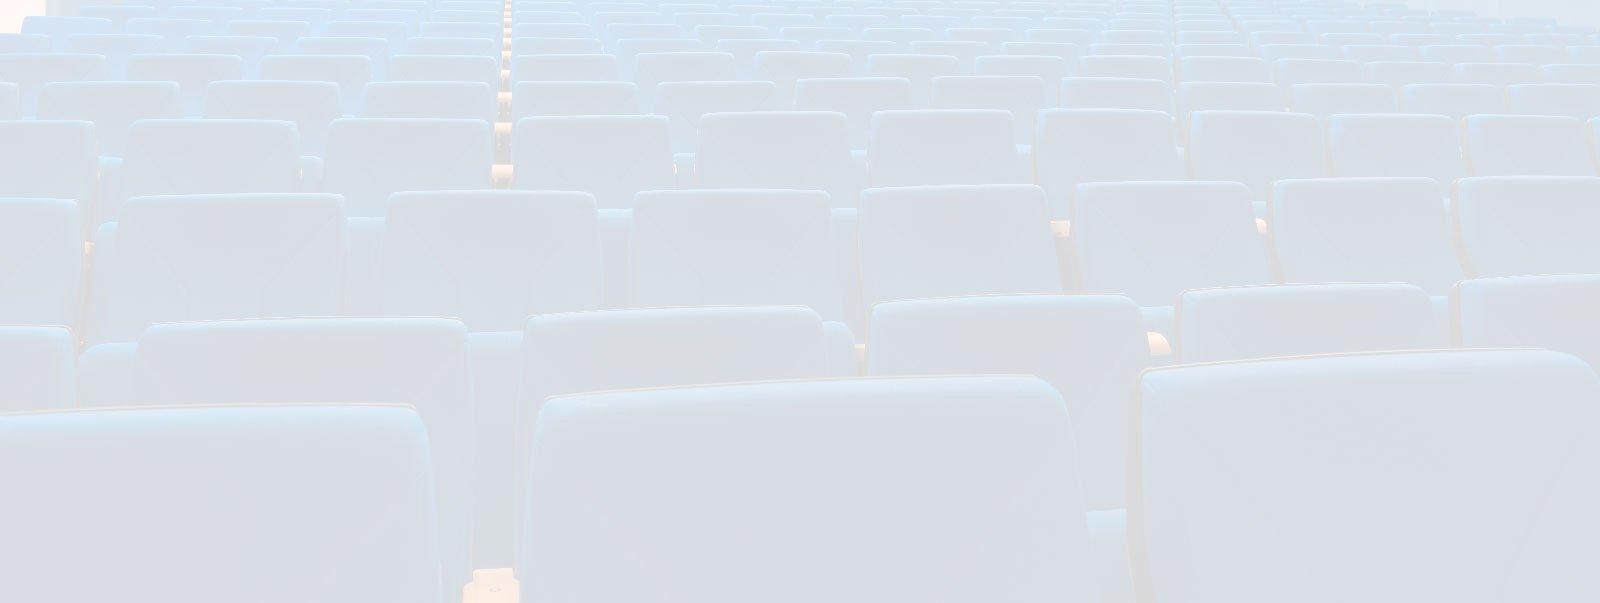 bg auditorio